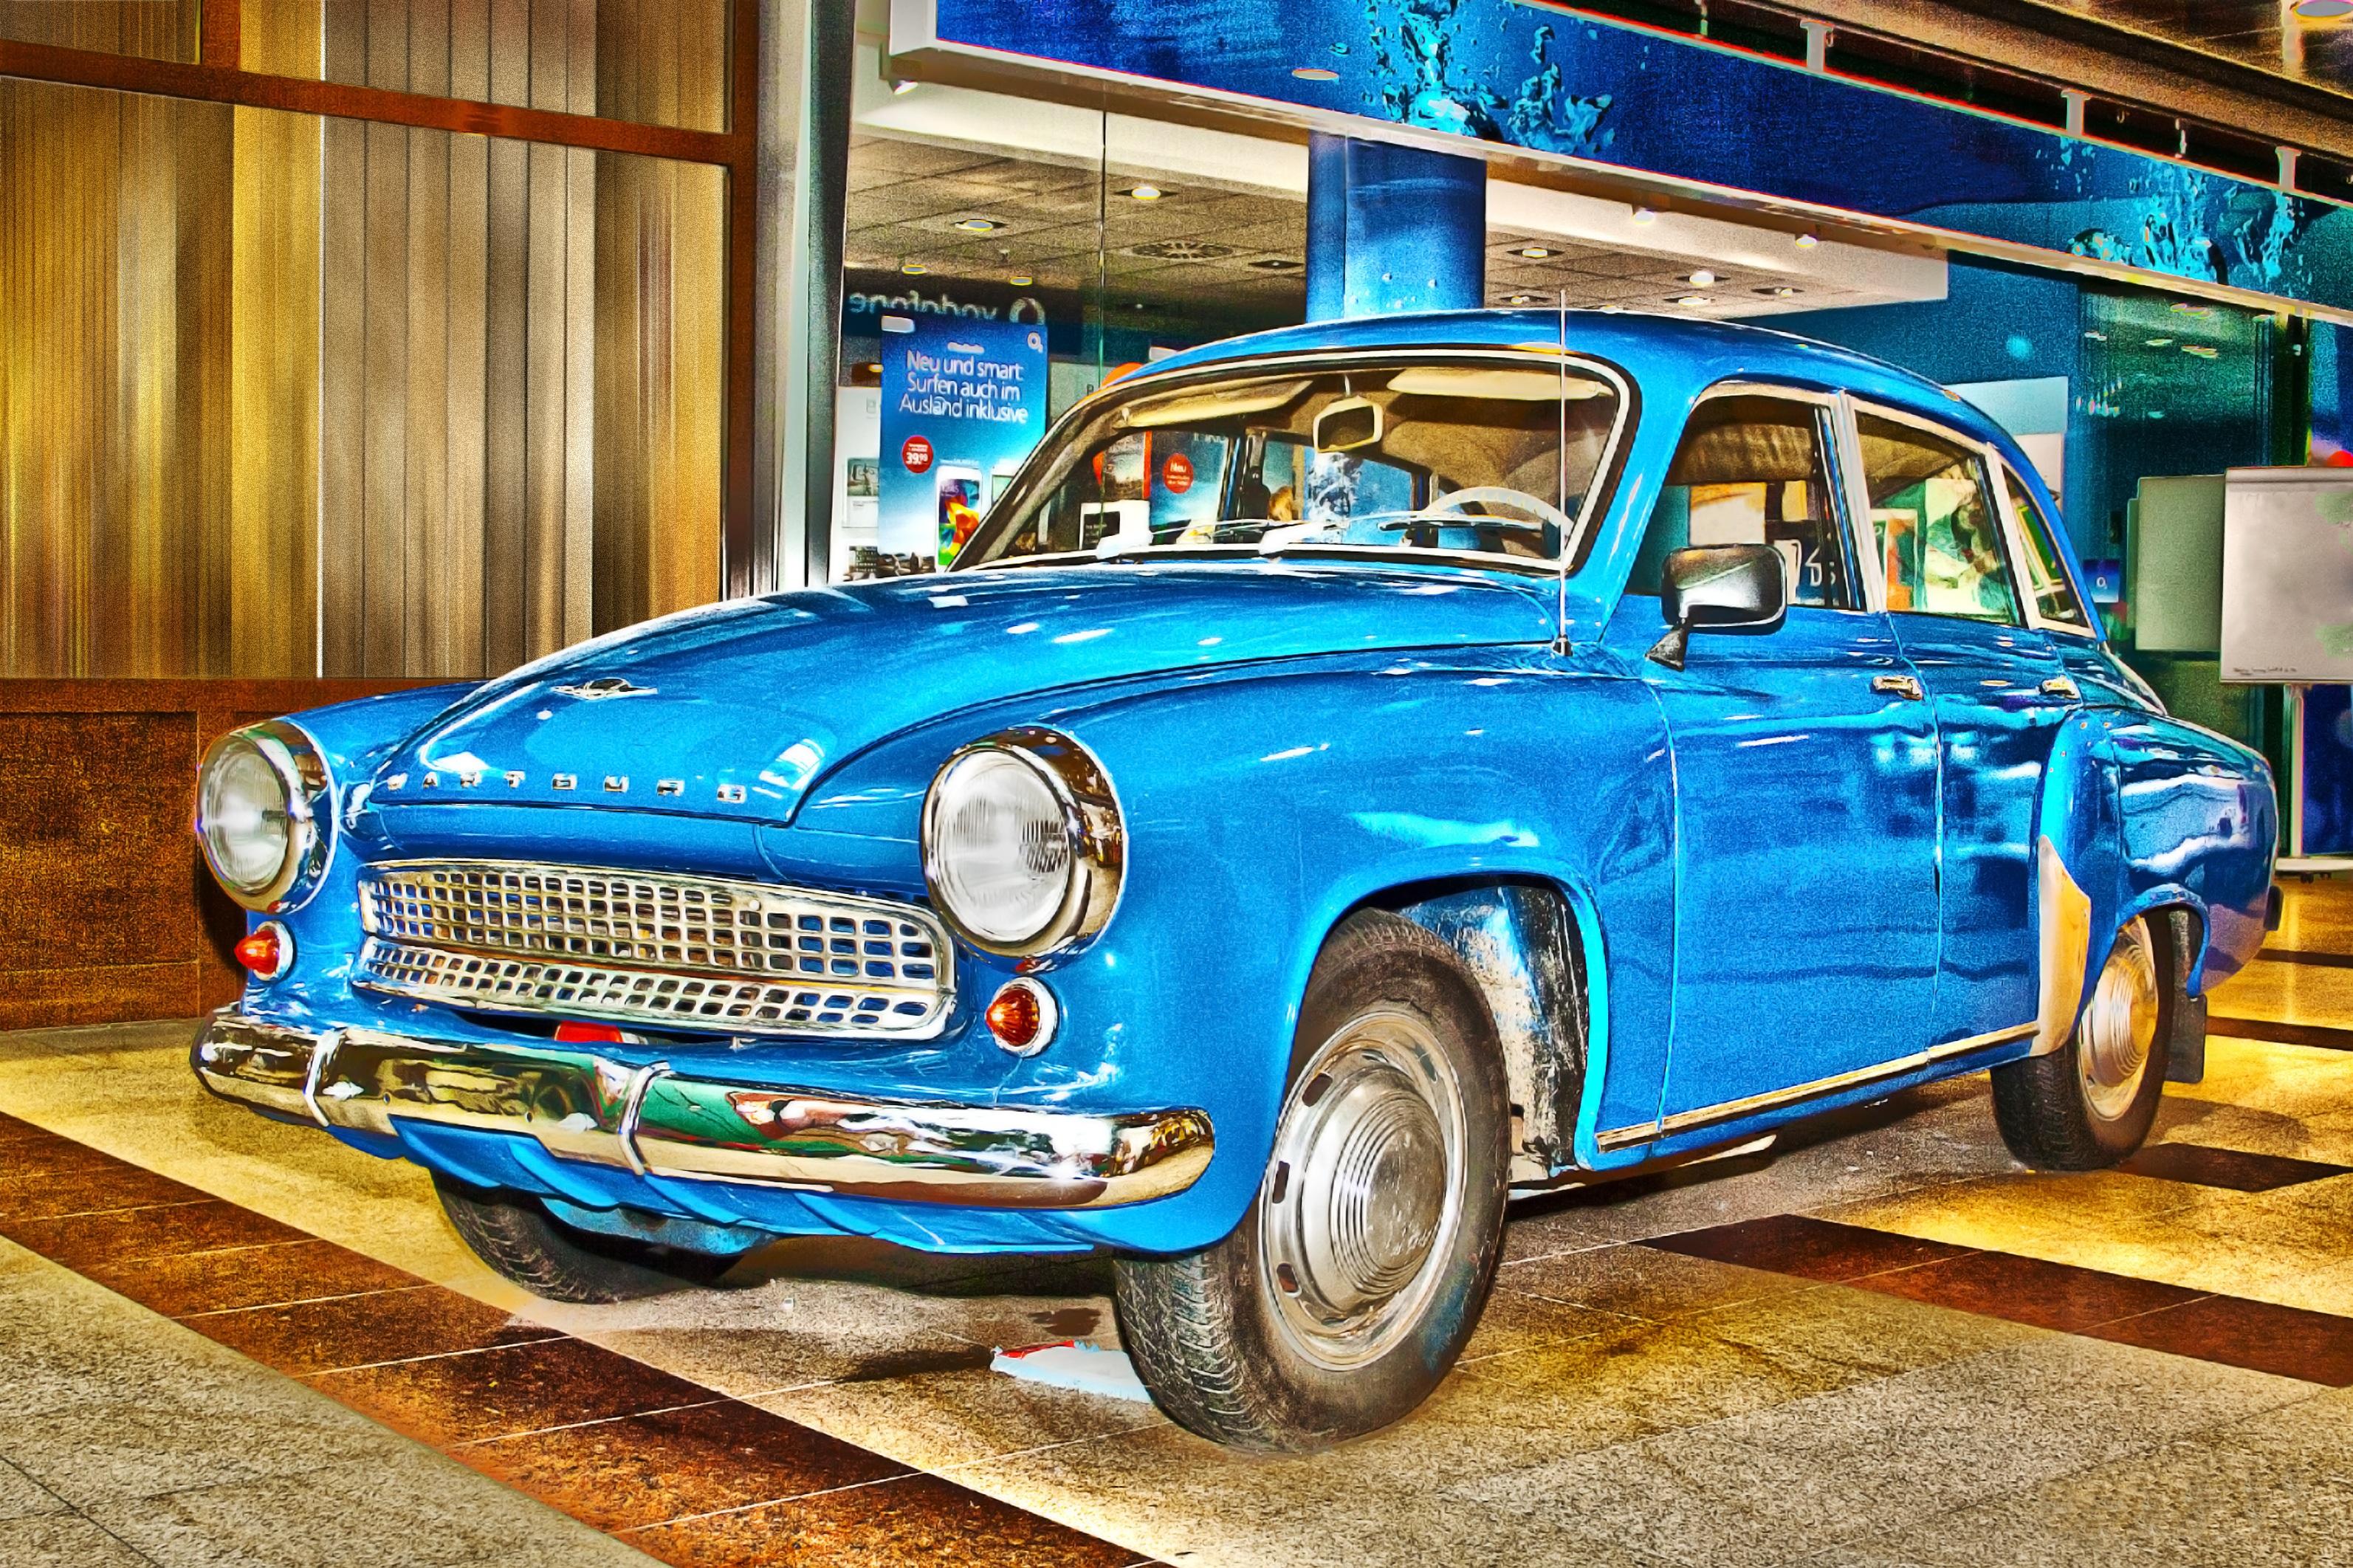 free images : retro, auto, blue, classic car, motor vehicle